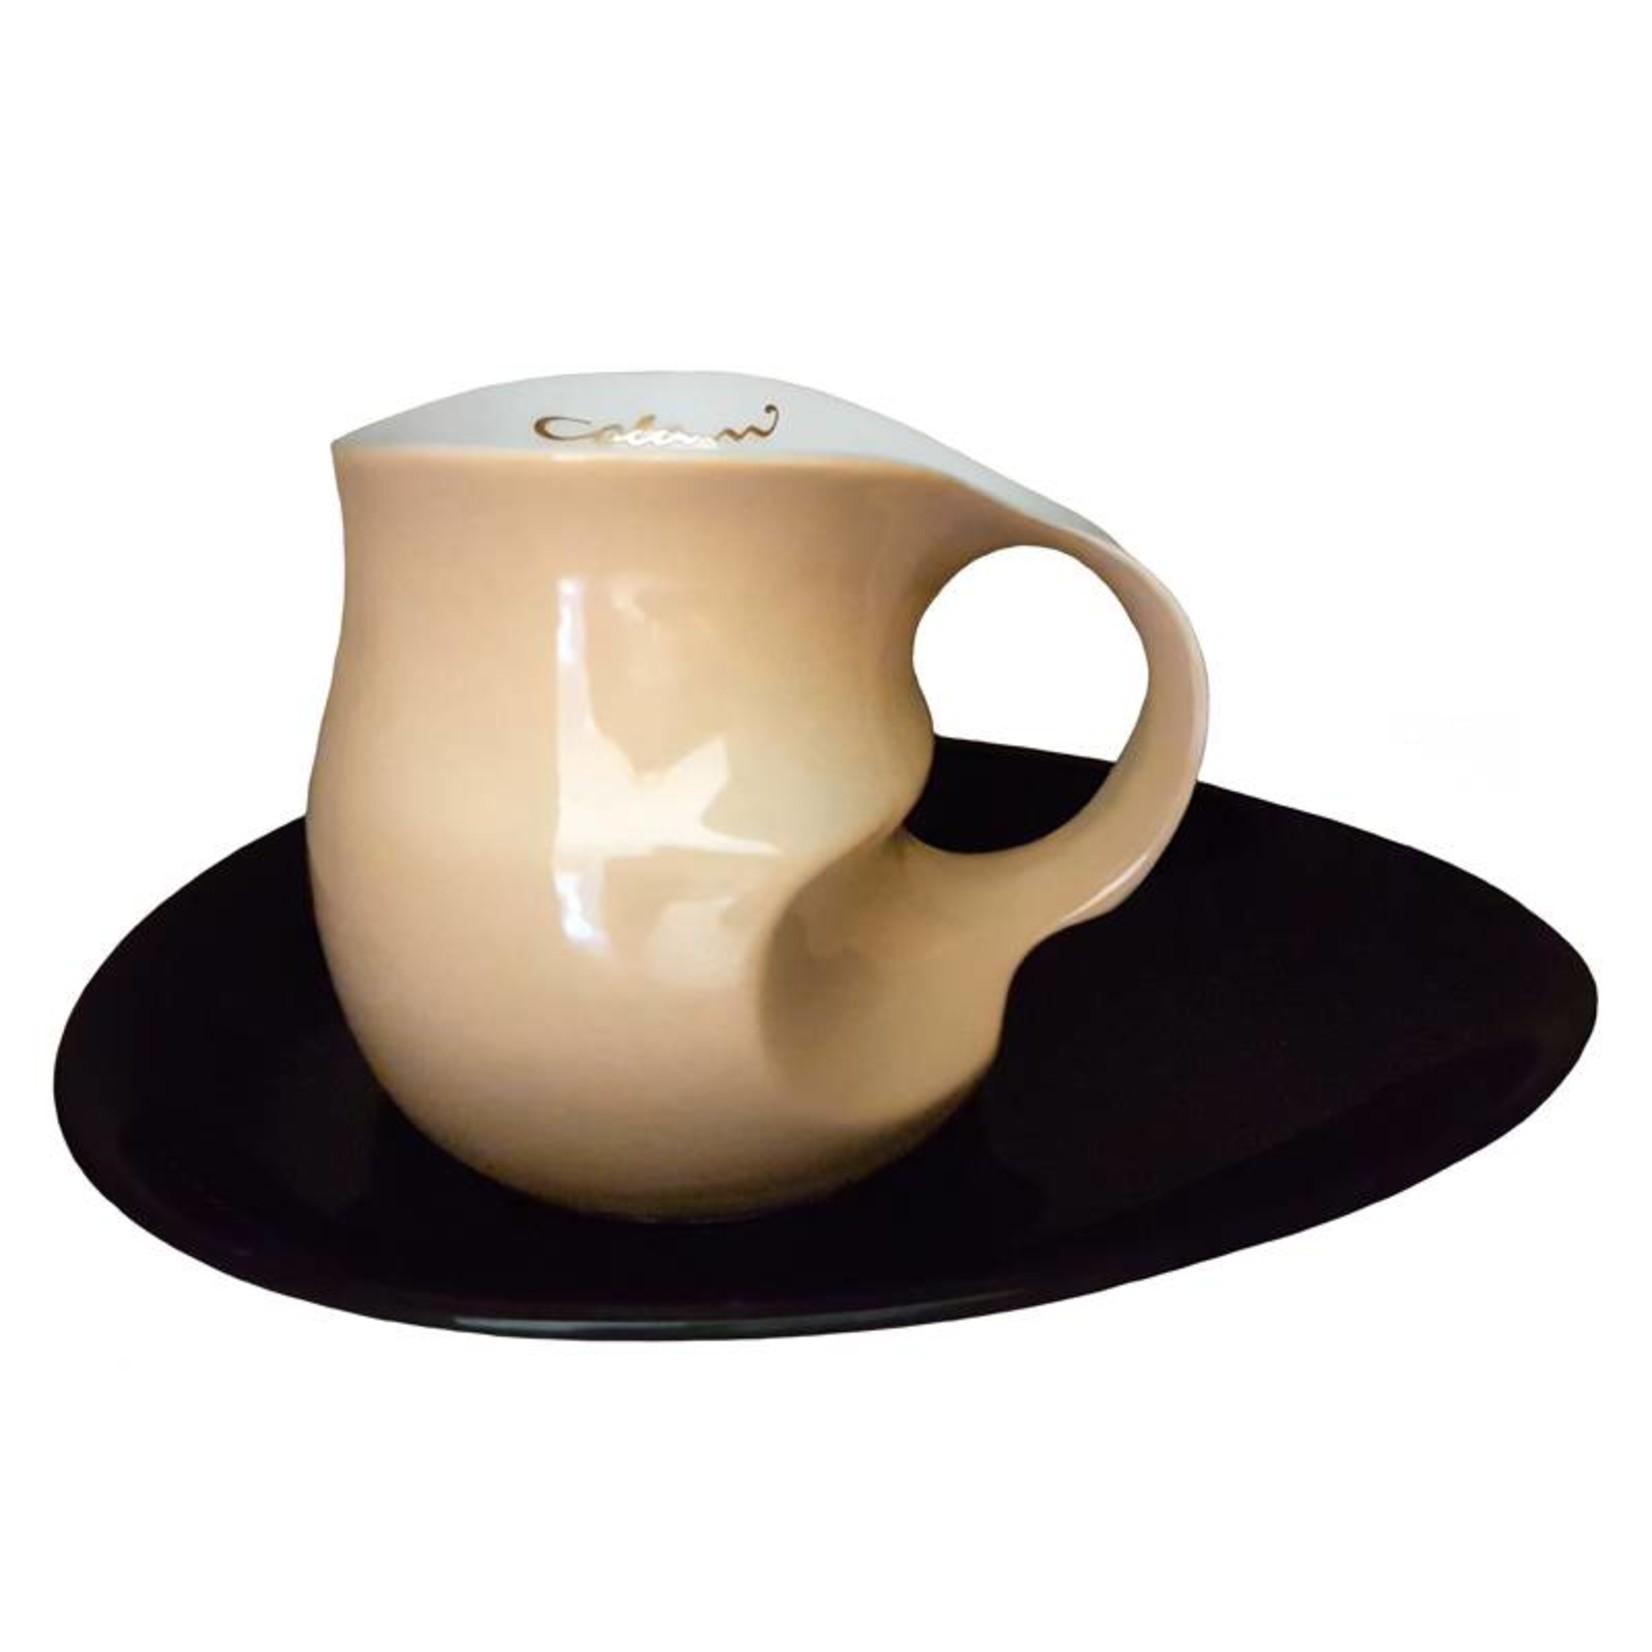 Colani Porzellanserie Colani Kaffee-/Cappuccinotasse | Tasse inkl. Unterteller | sand